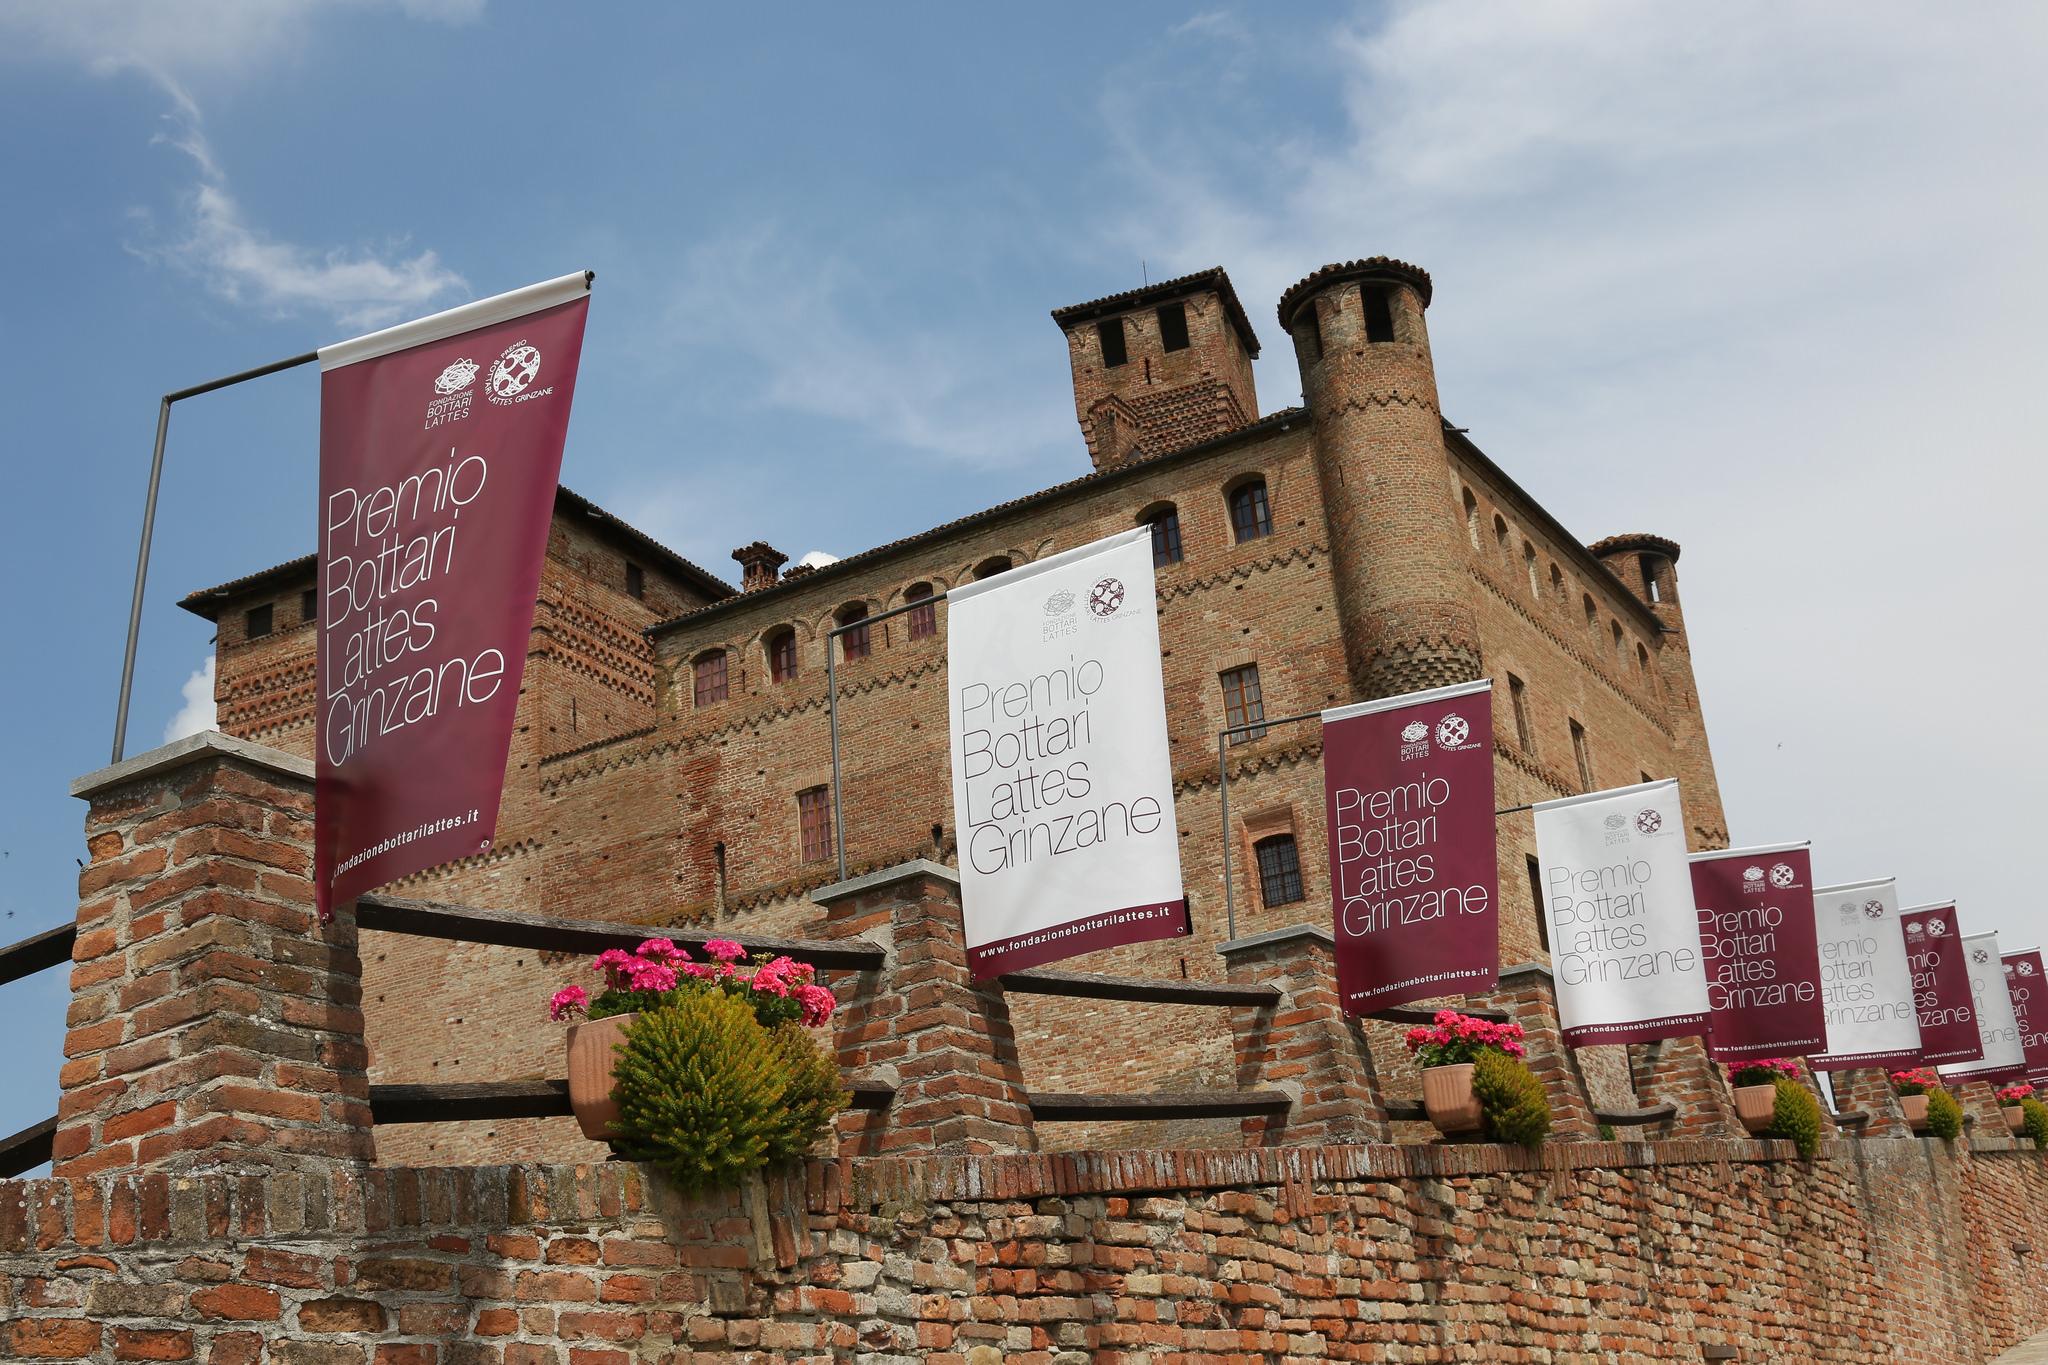 castello-grinzane-premio-bottari-lattes